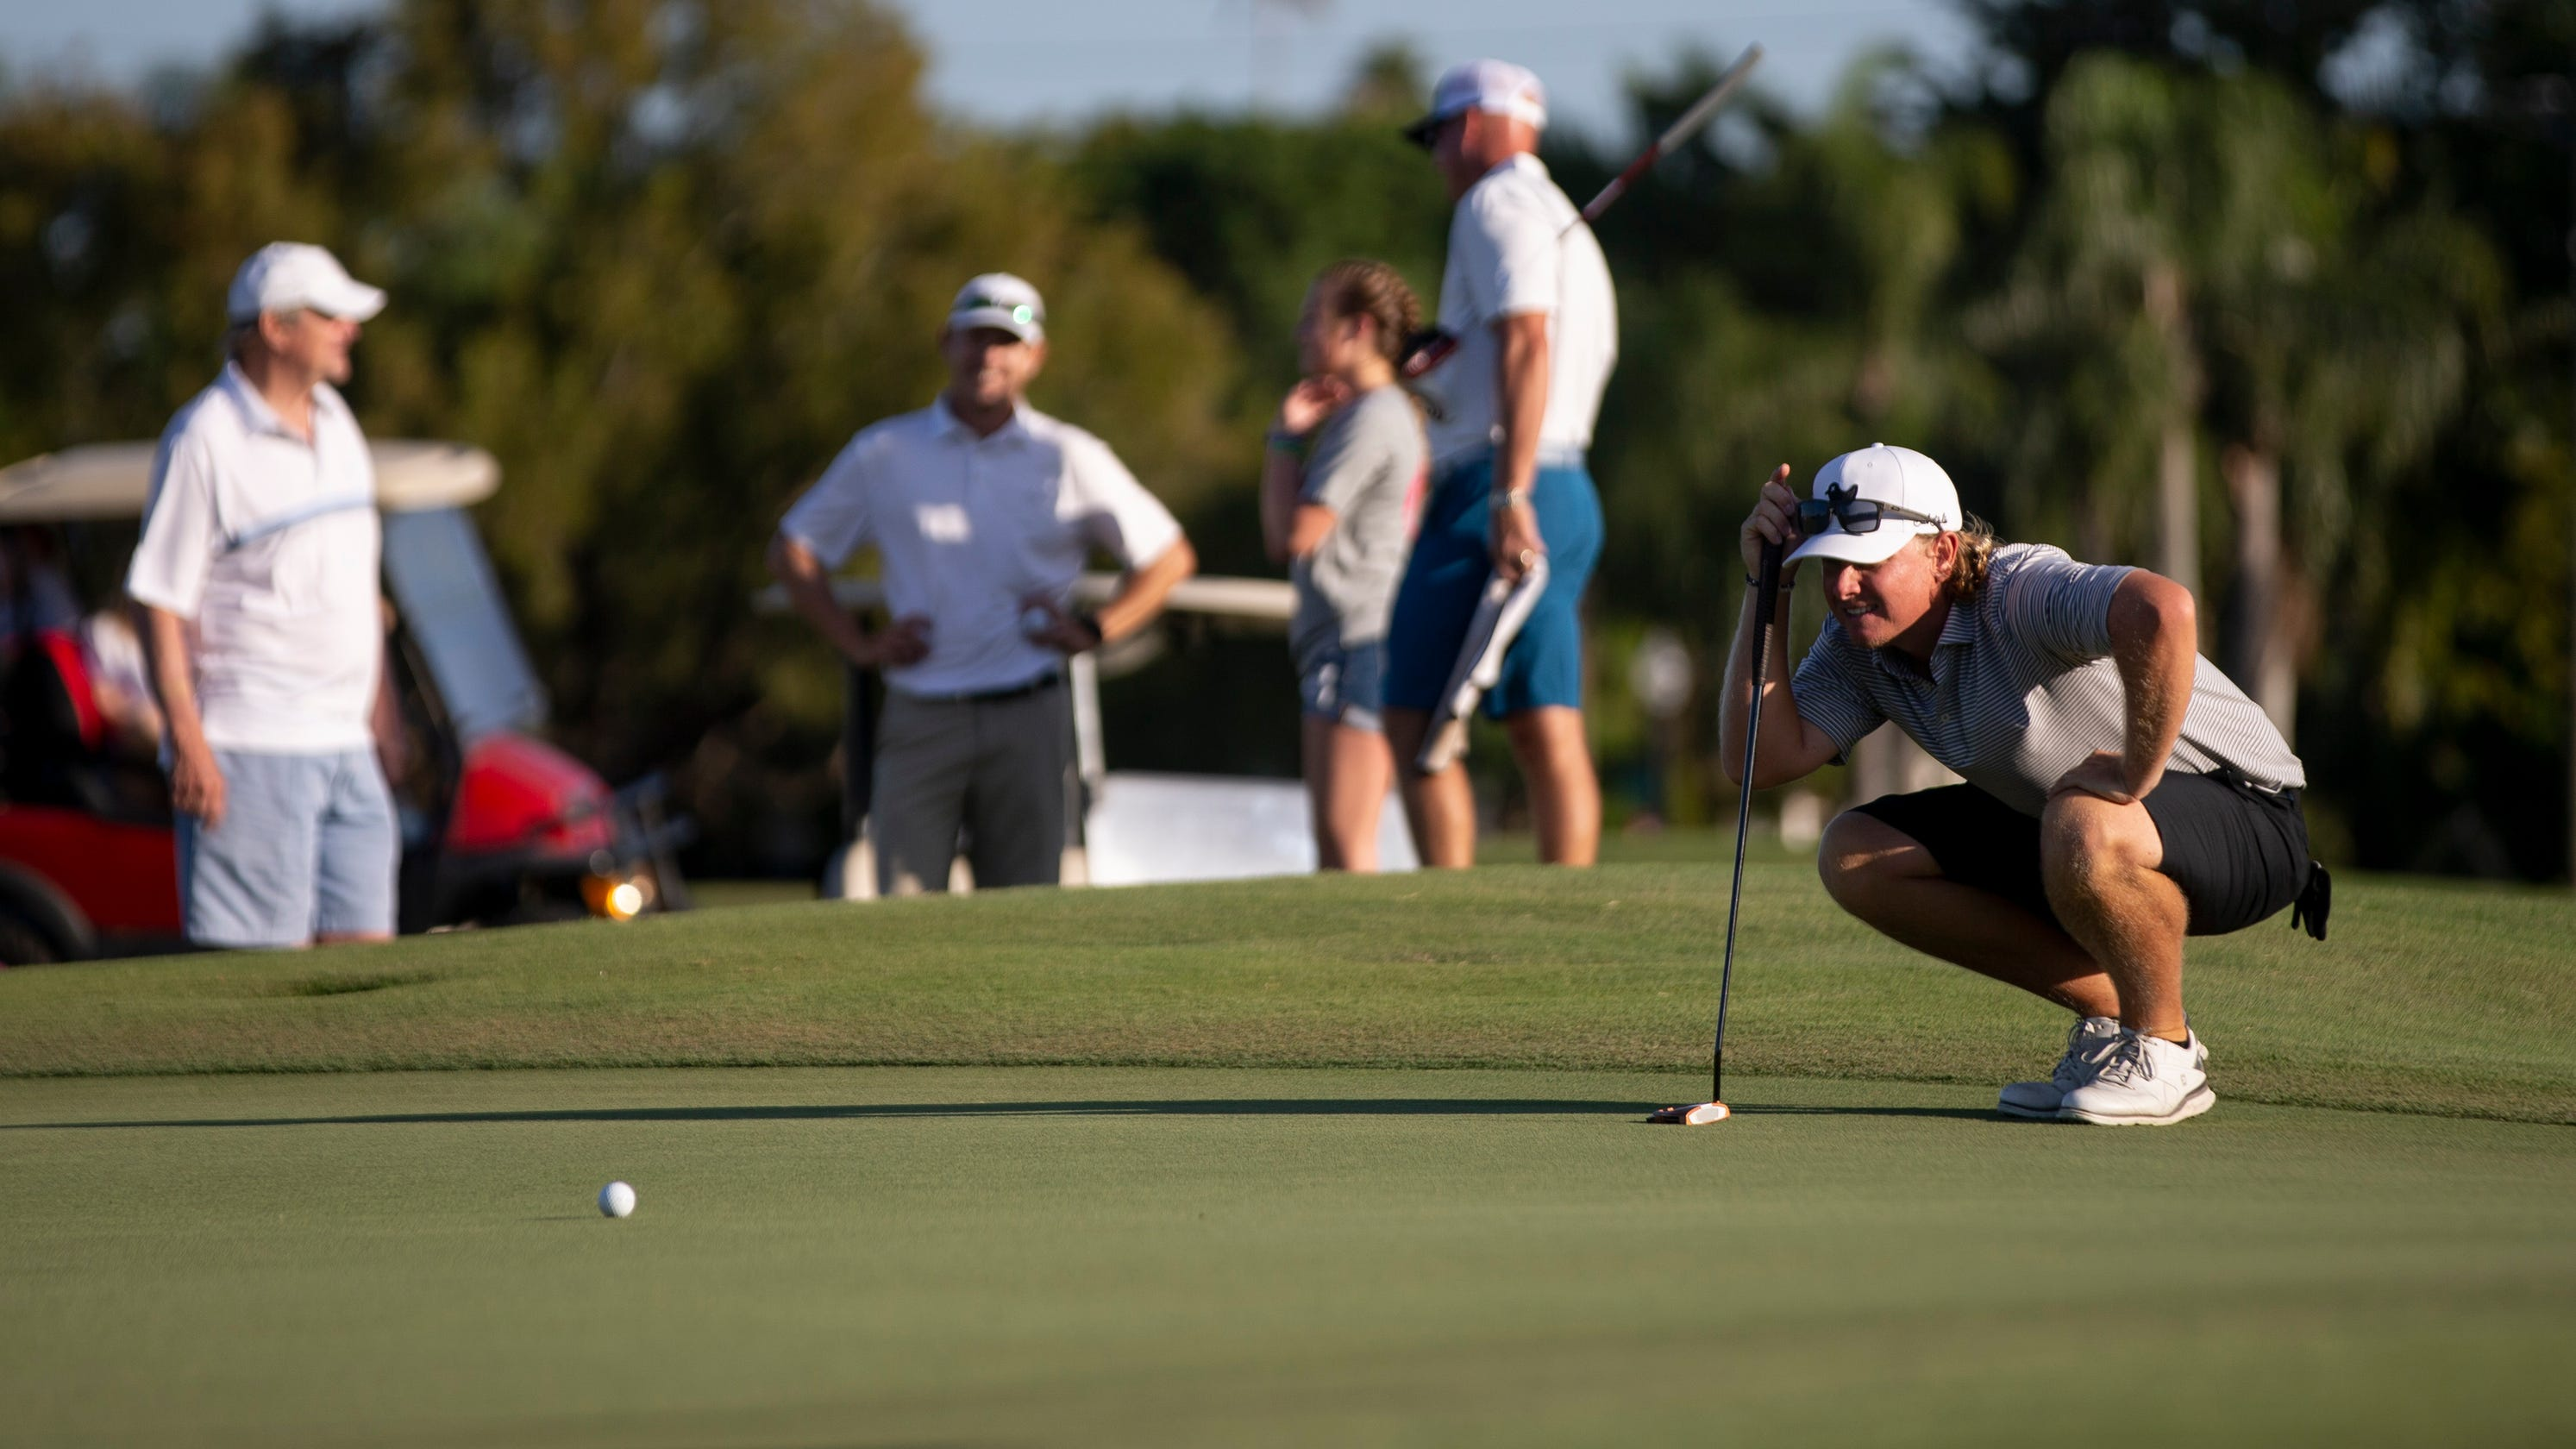 Southwest Florida golf: Cape Coral native, FGCU senior share medalist honors at Naples U.S. Open qualifier